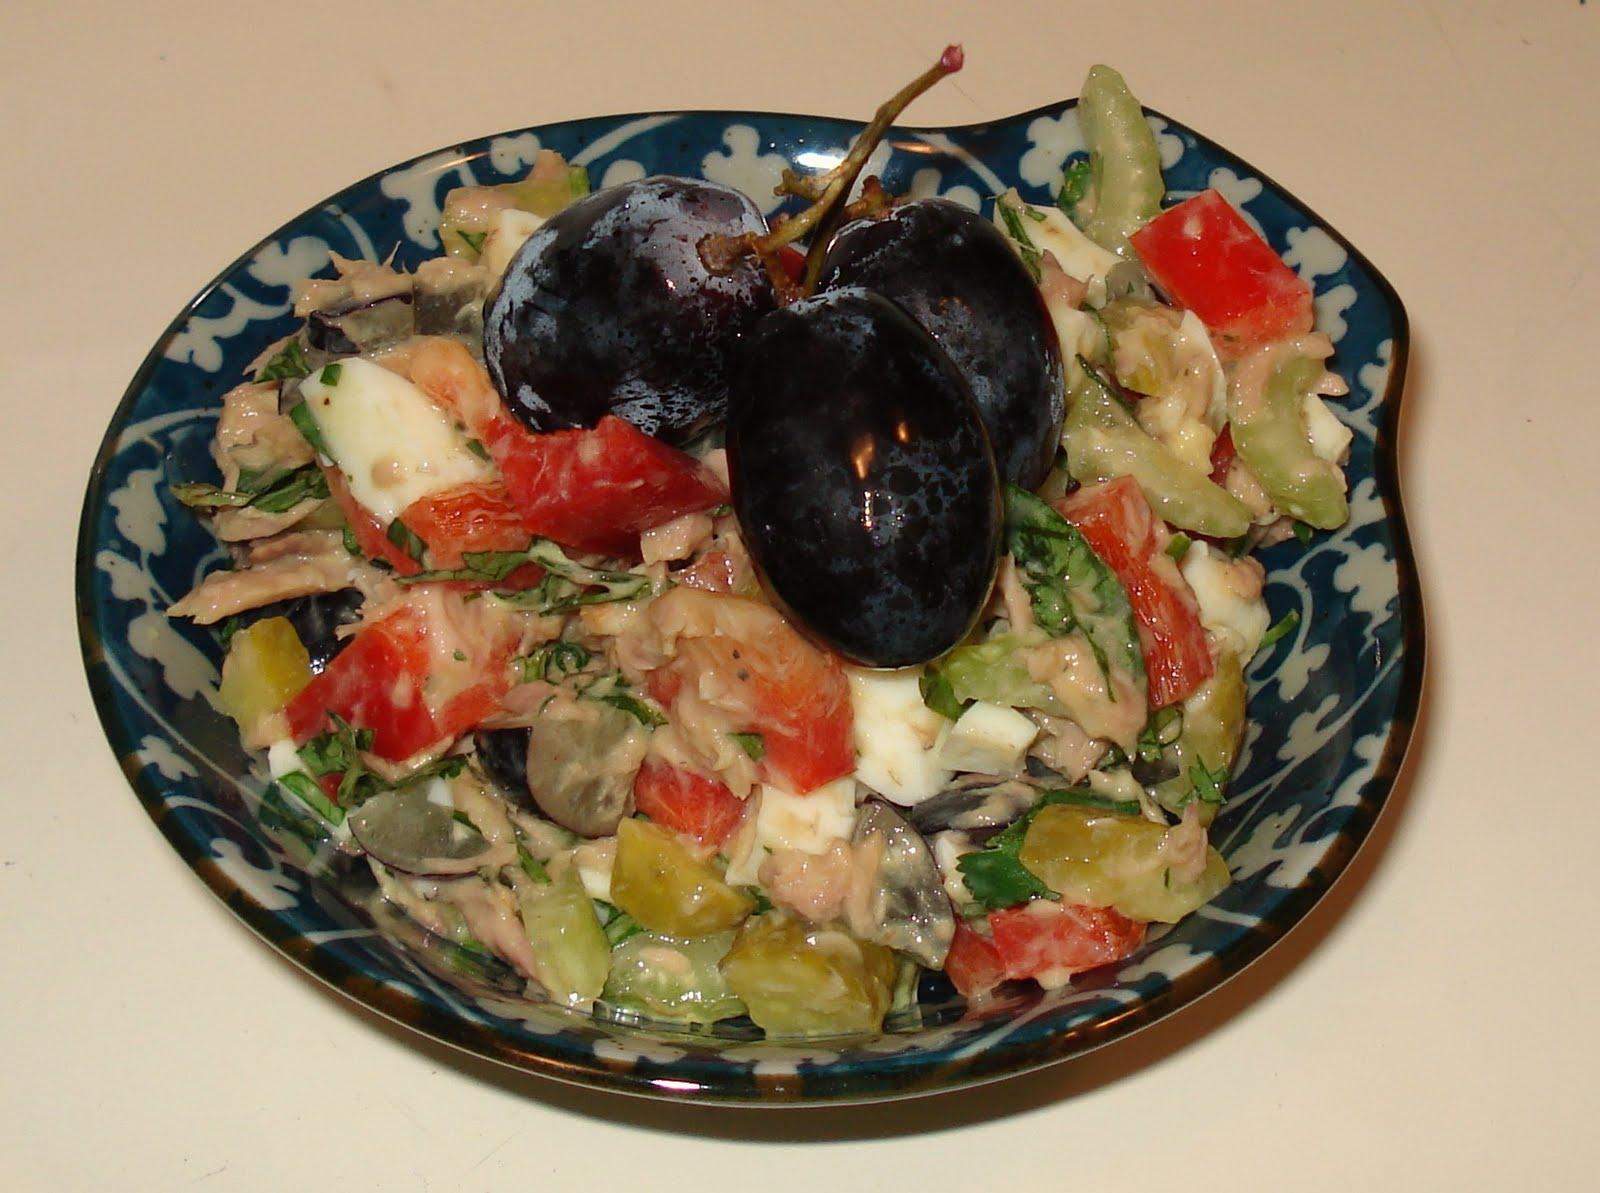 1200 calorie diet snacks for Tuna fish salad calories